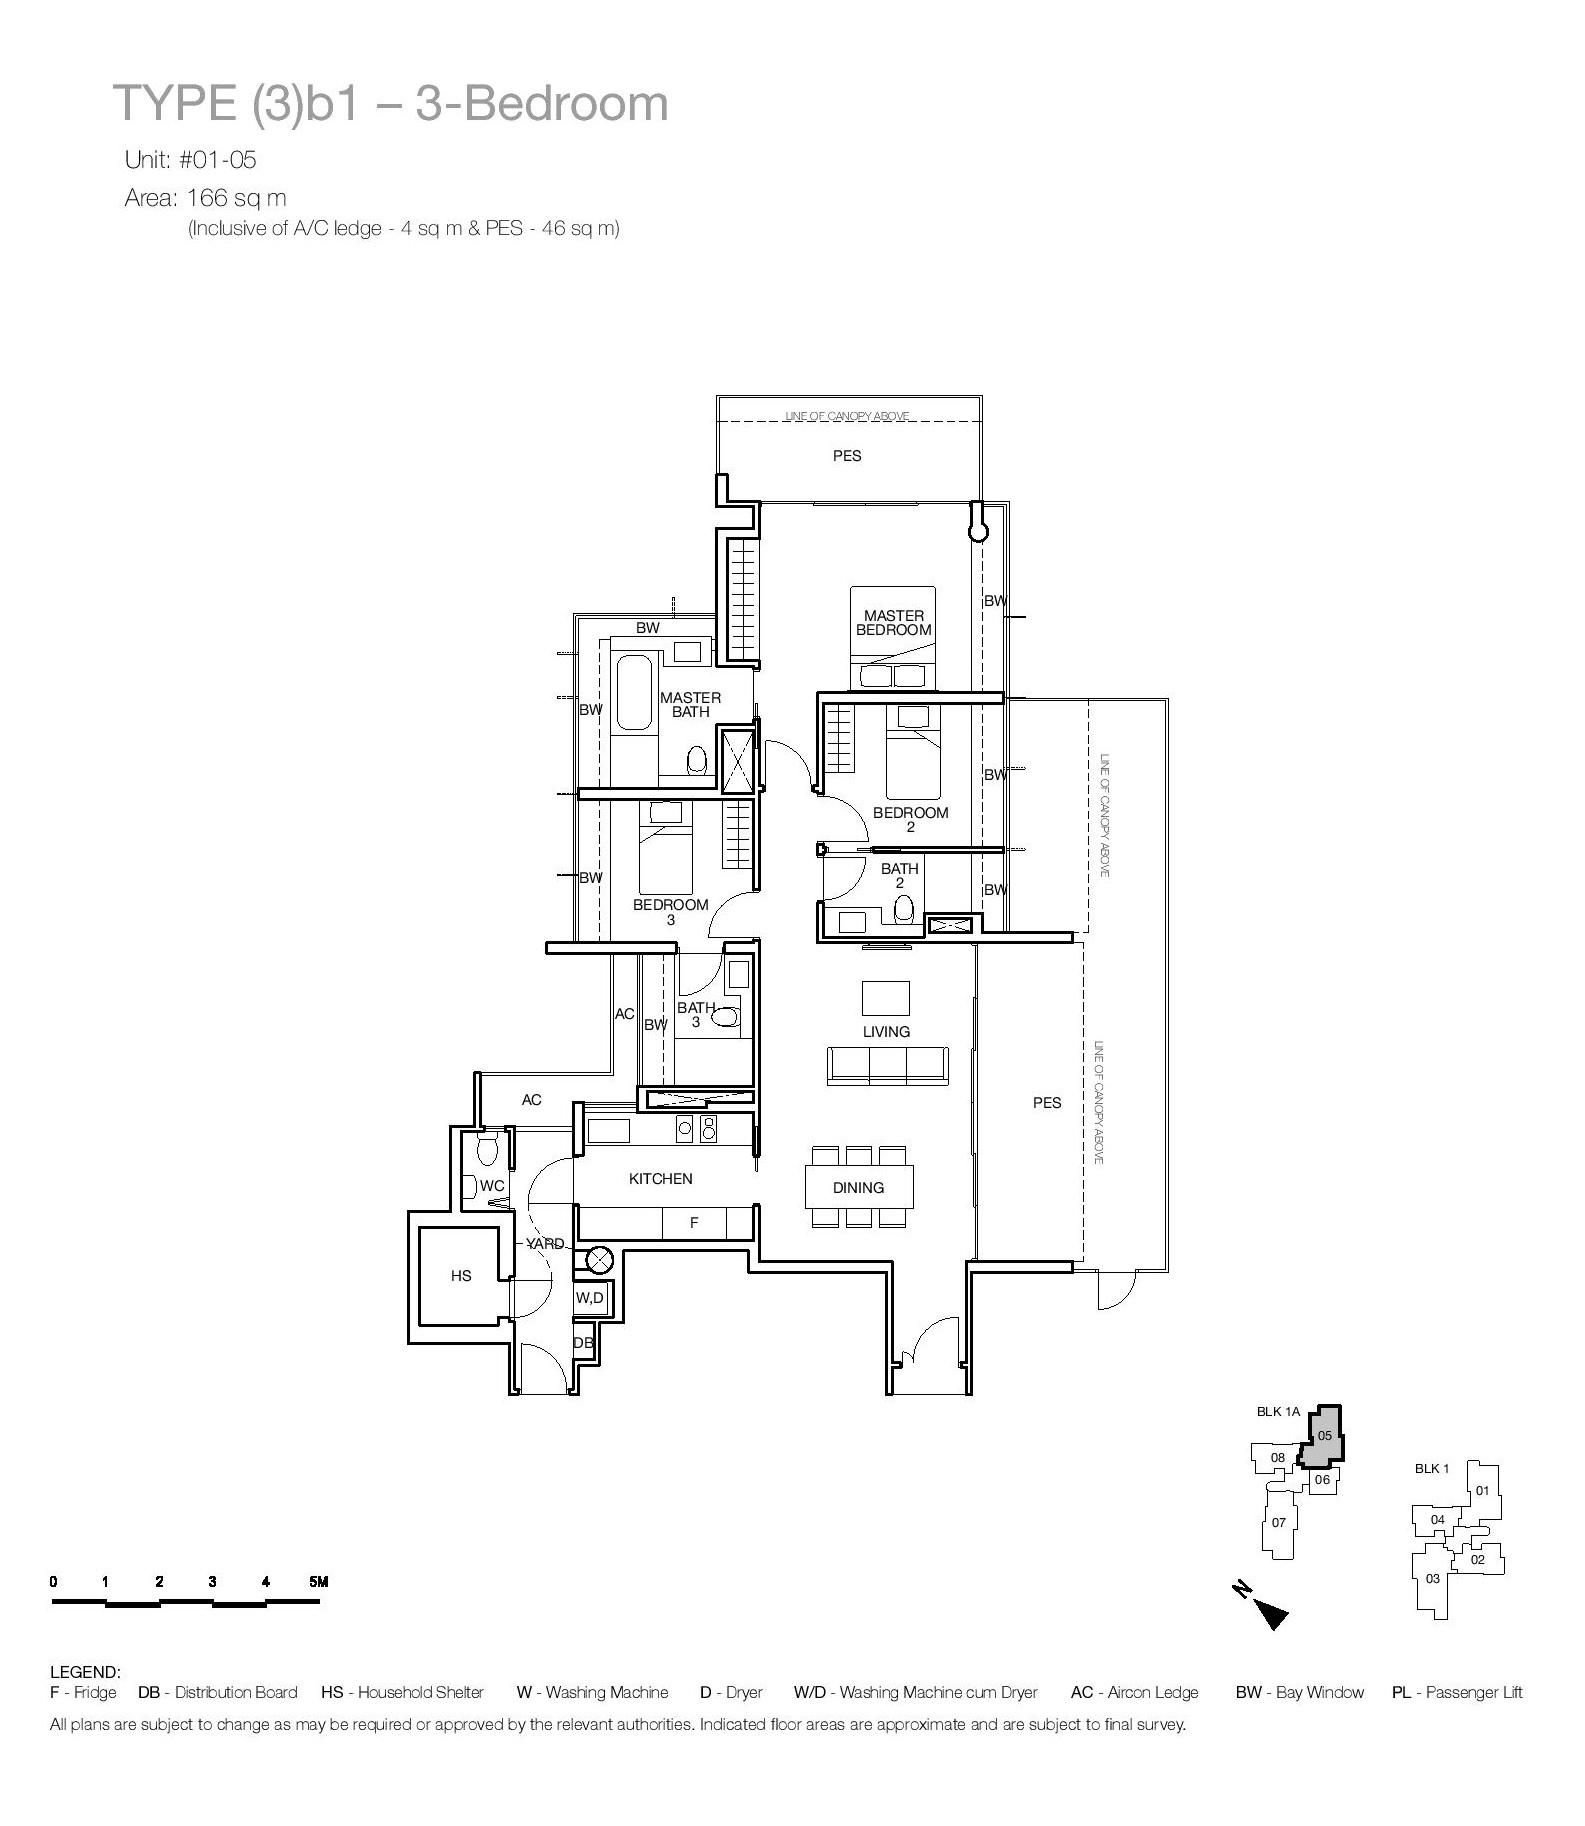 One Balmoral 3 Bedroom Floor Type (3)b1 Plans